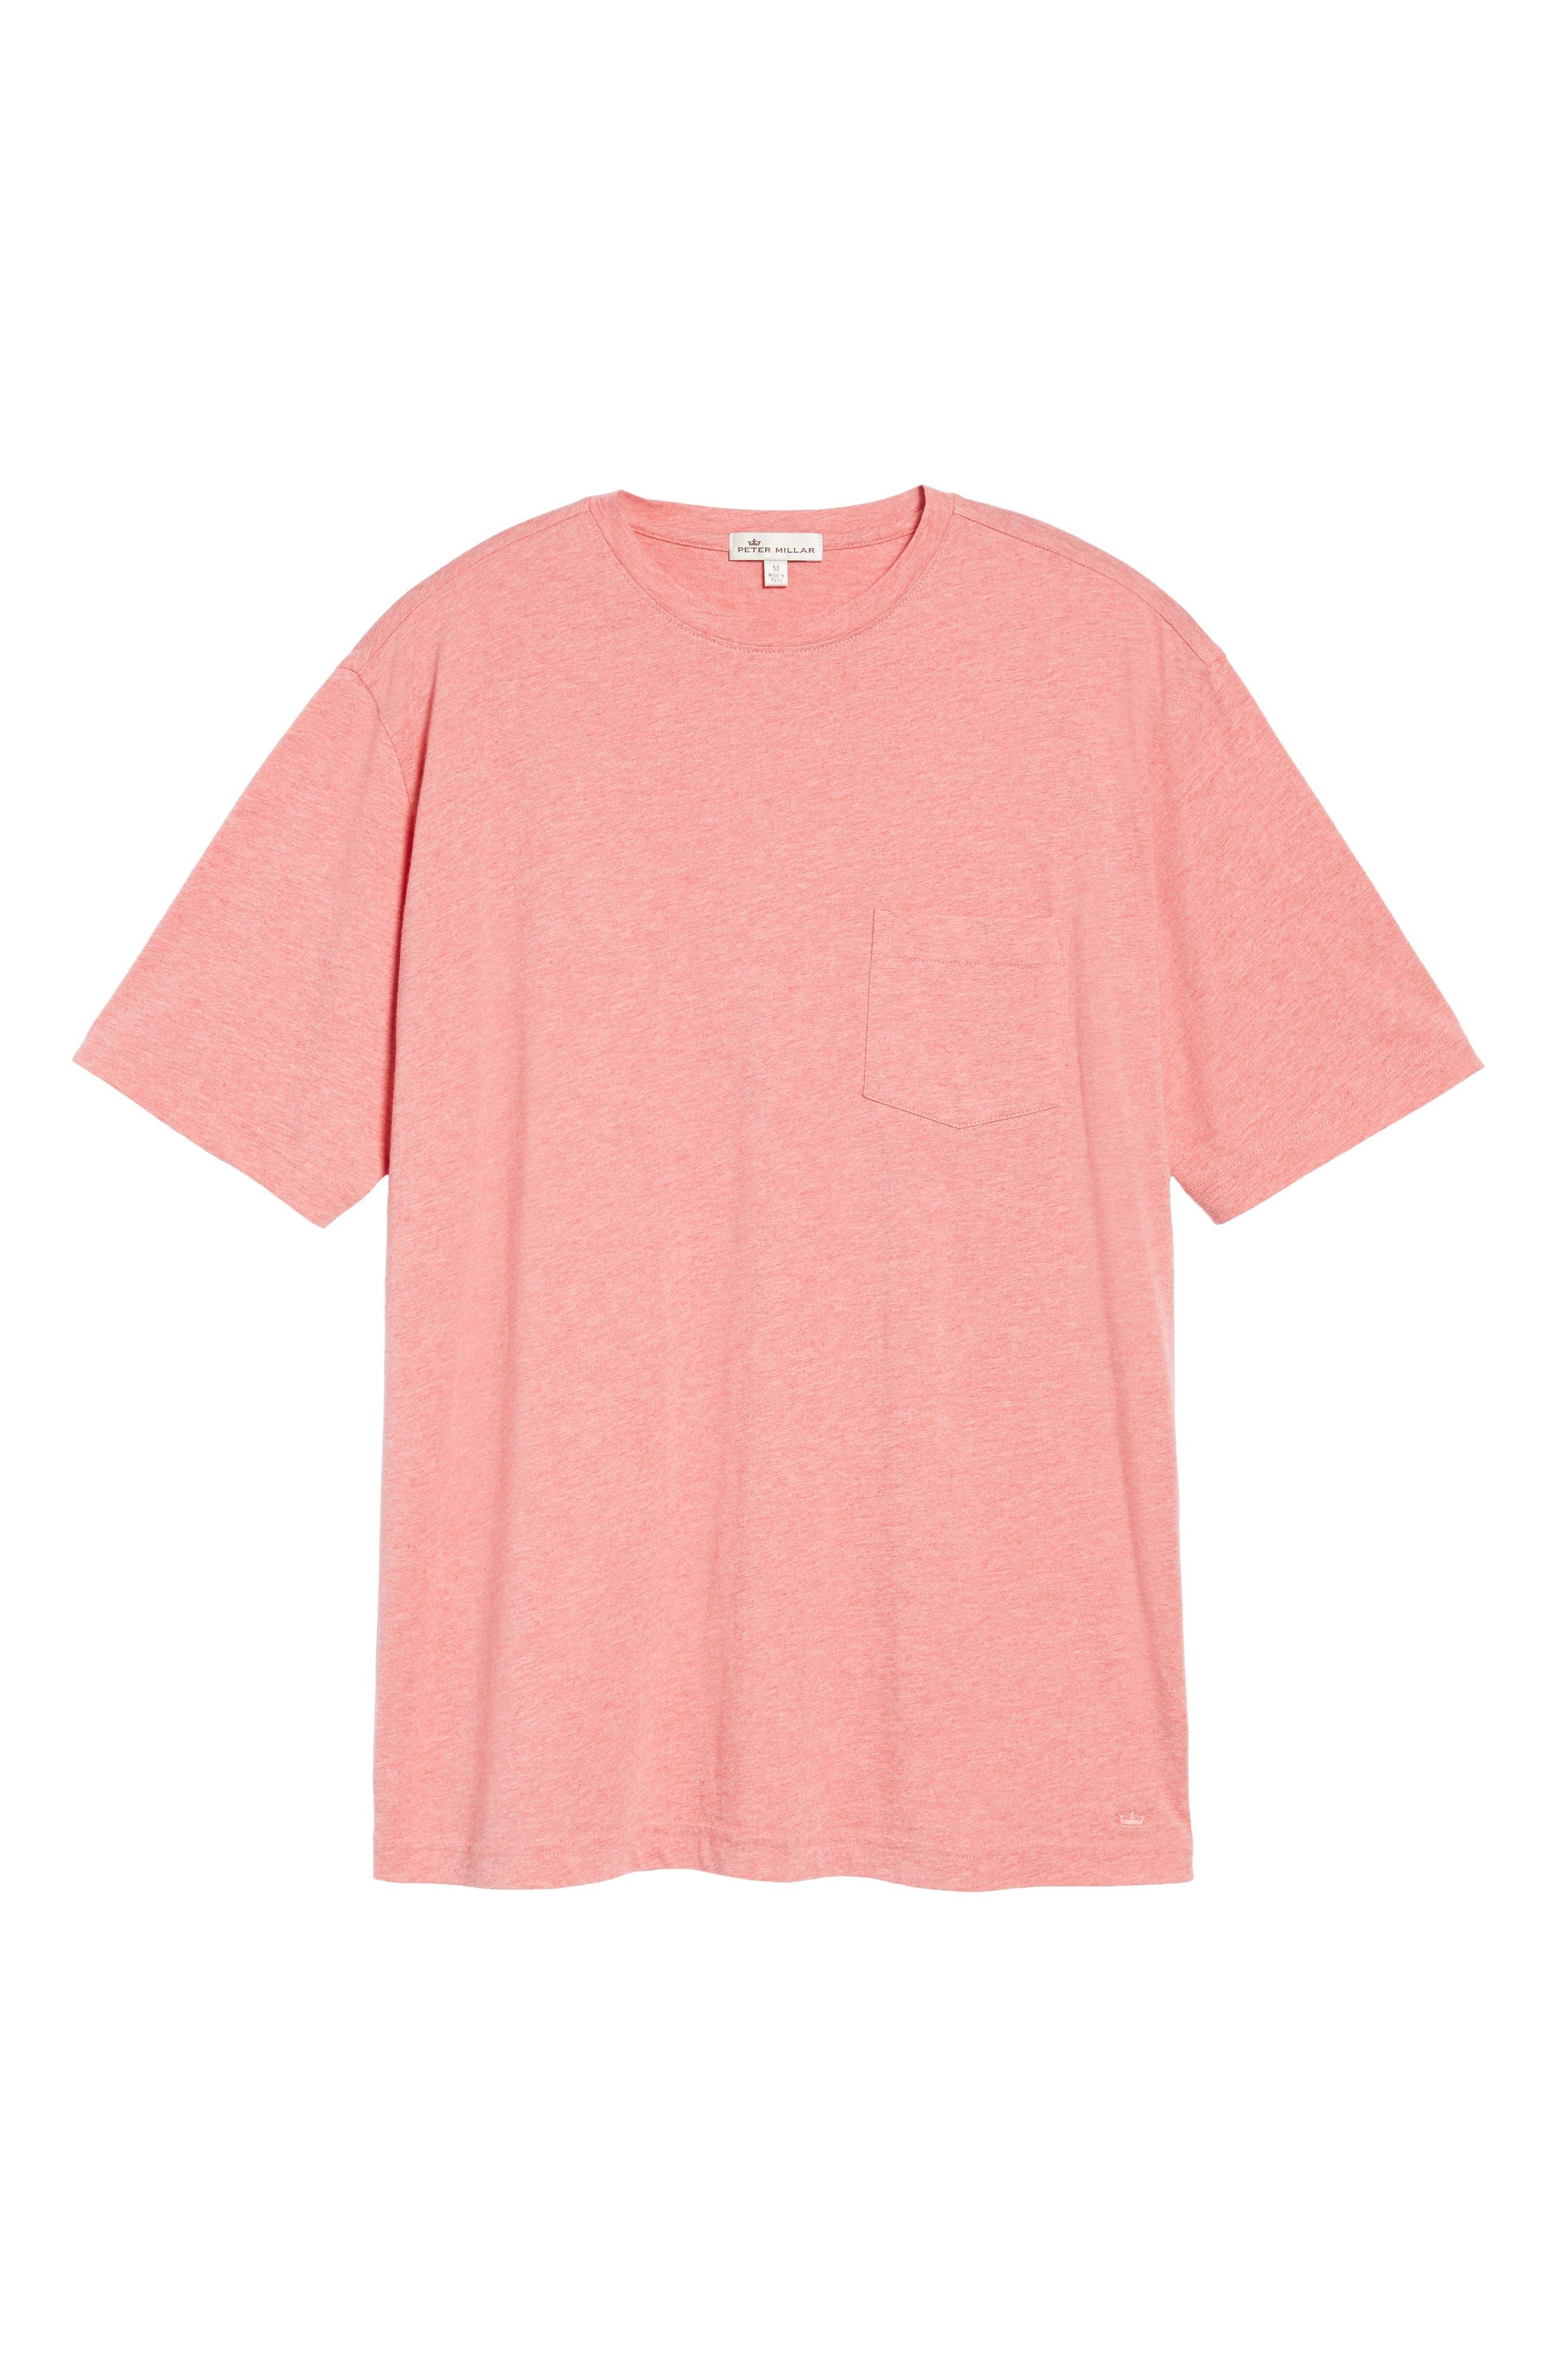 Crown Pocket T-Shirt,                             Alternate thumbnail 18, color,